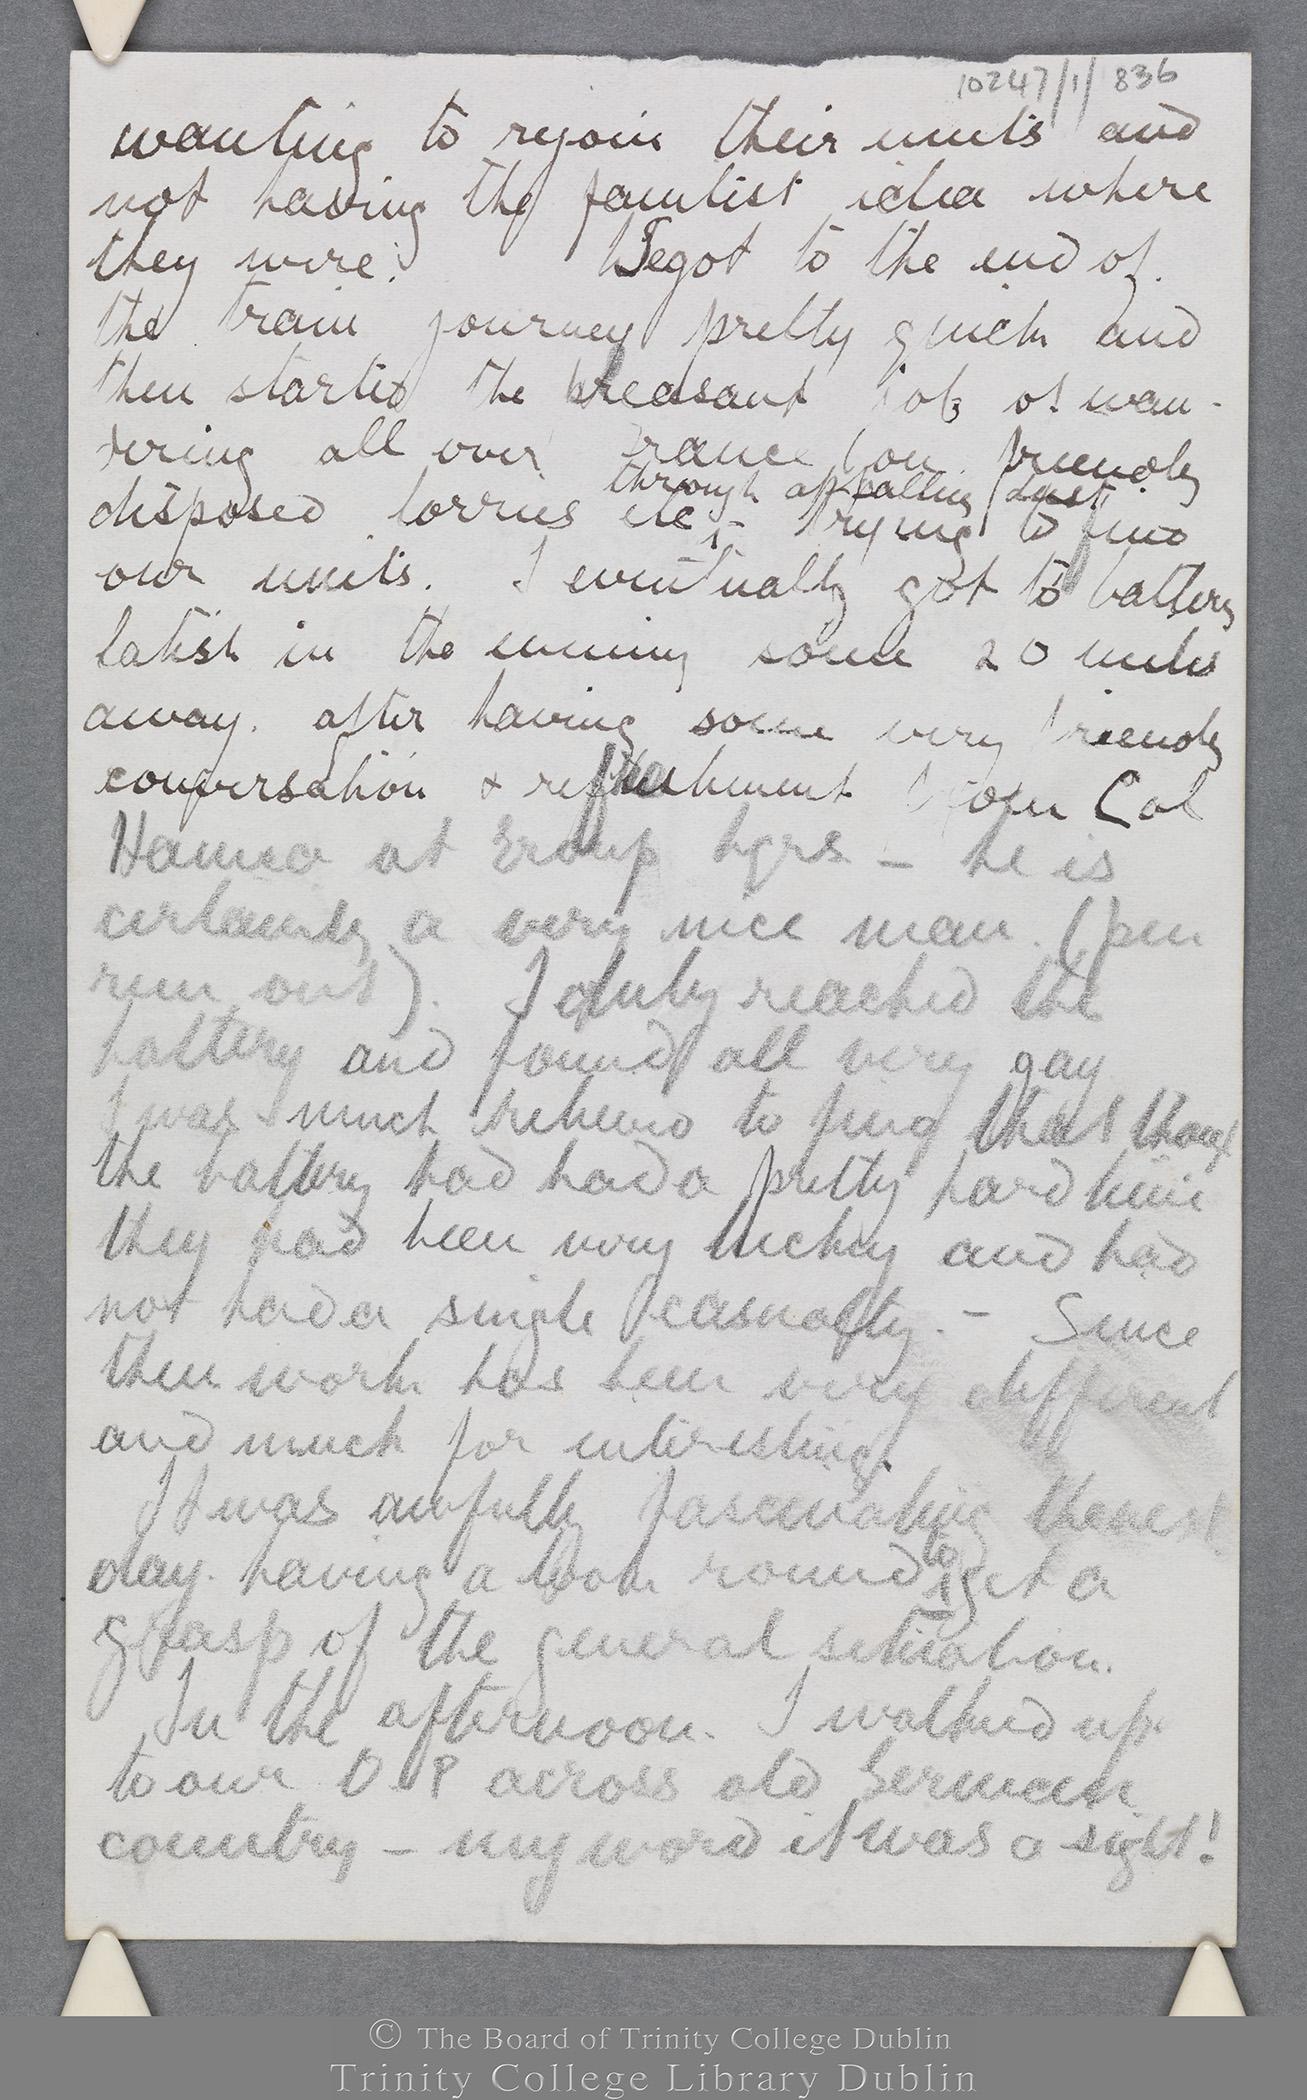 TCD MS 10247/1/836 folio 2 recto